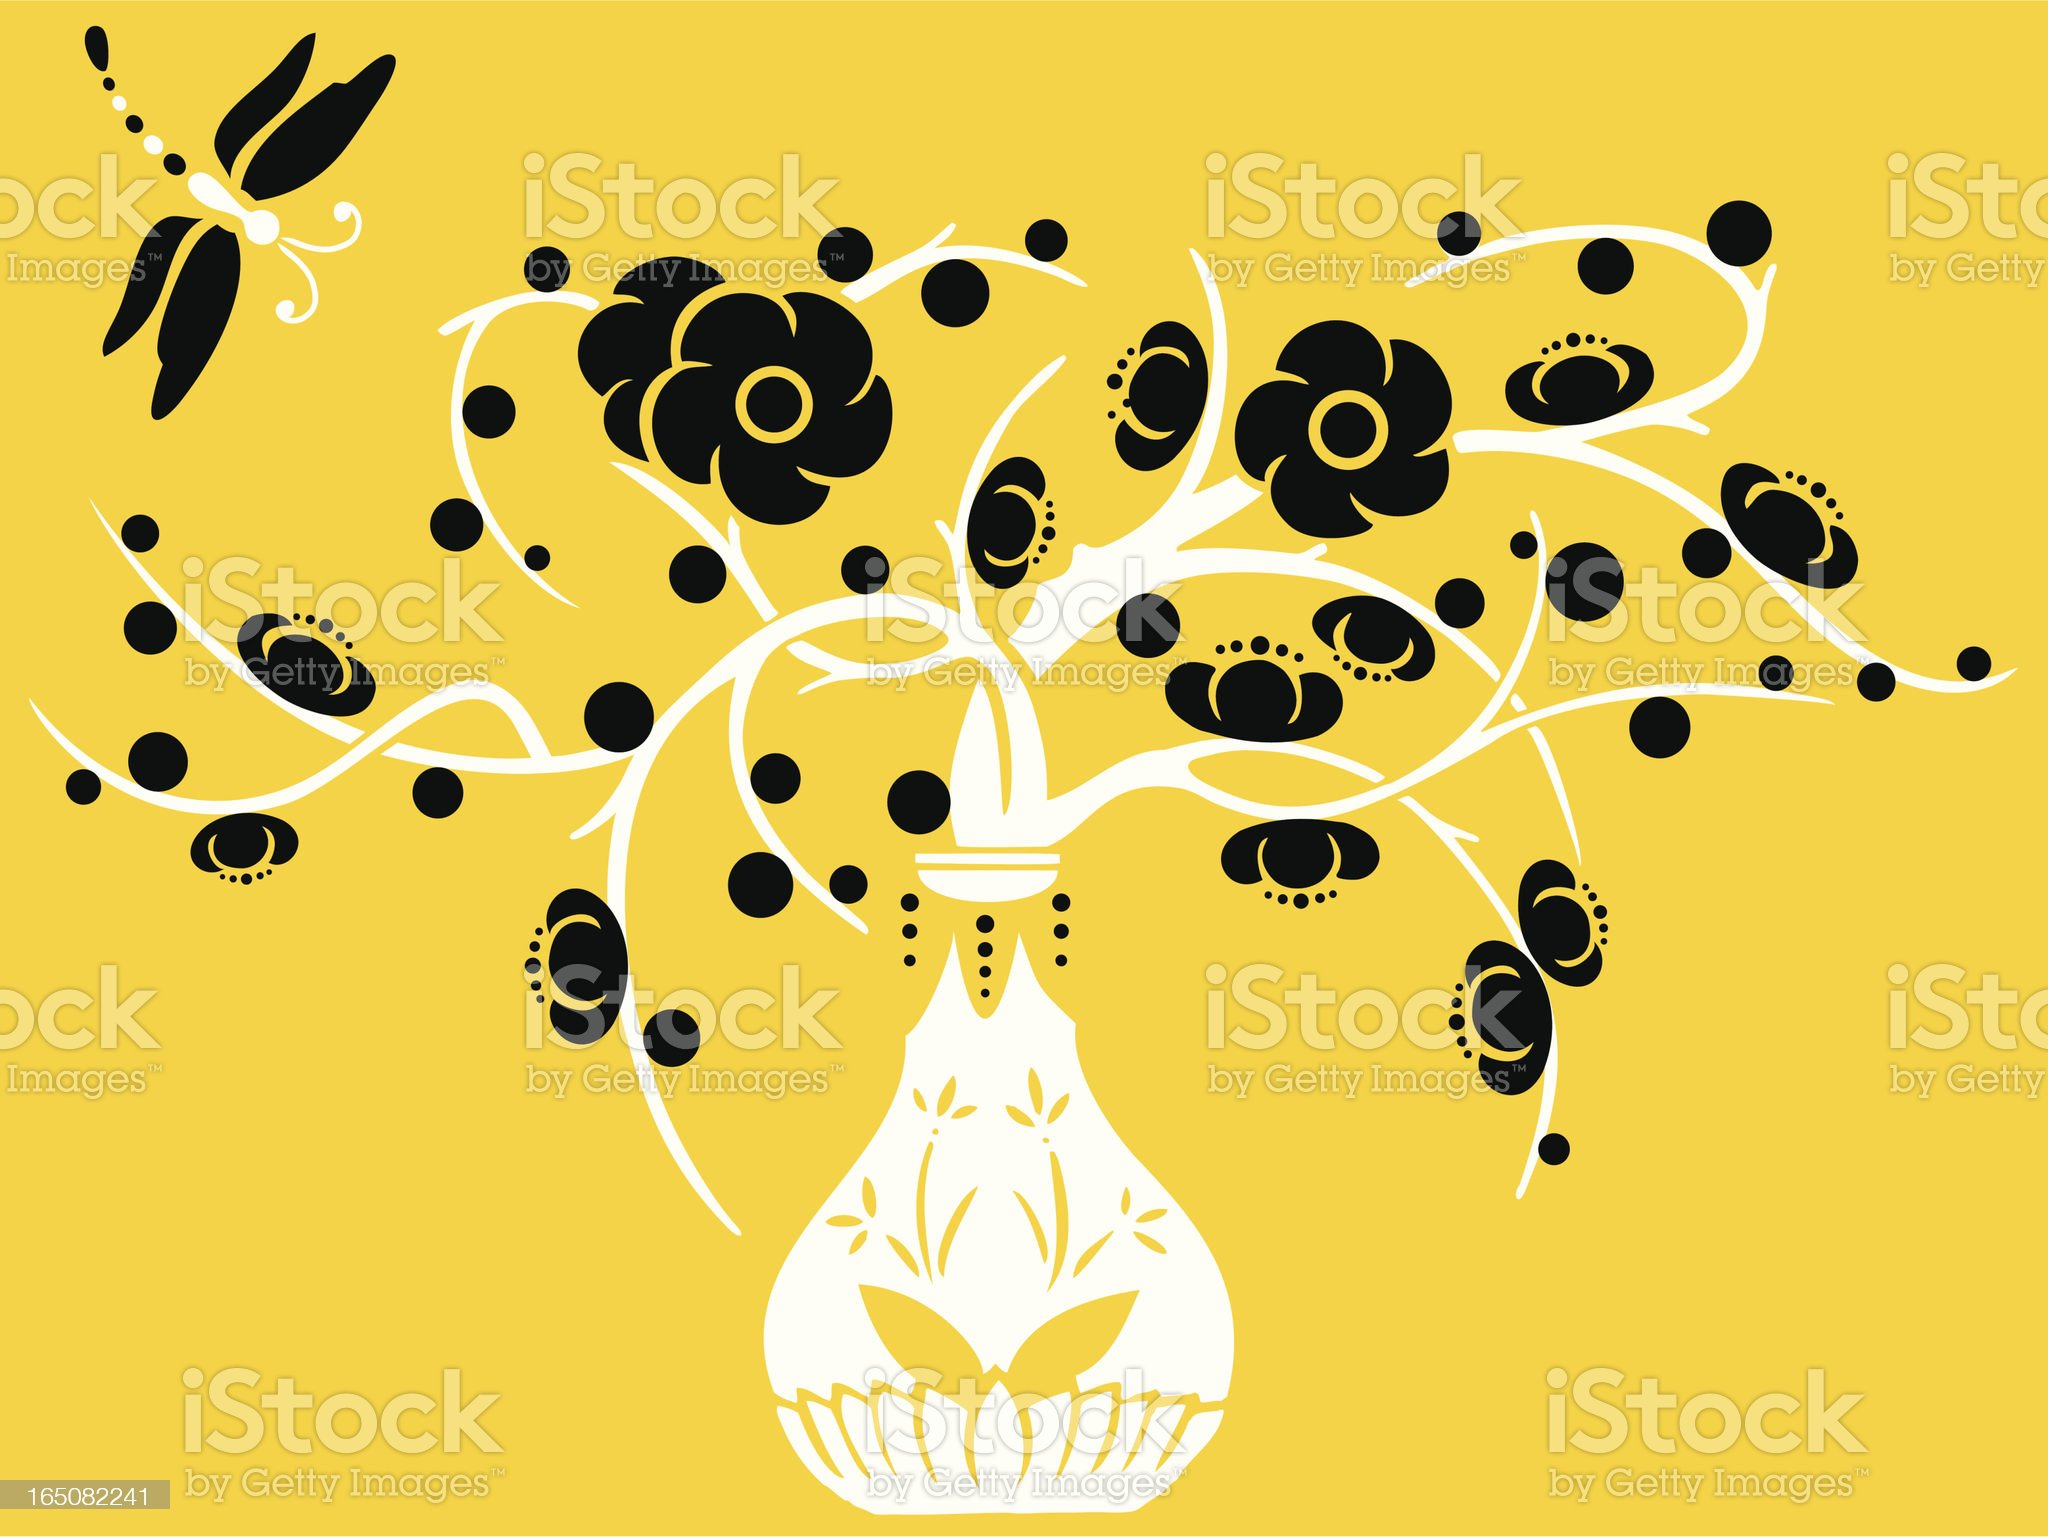 Vase & Dragonfly royalty-free stock vector art